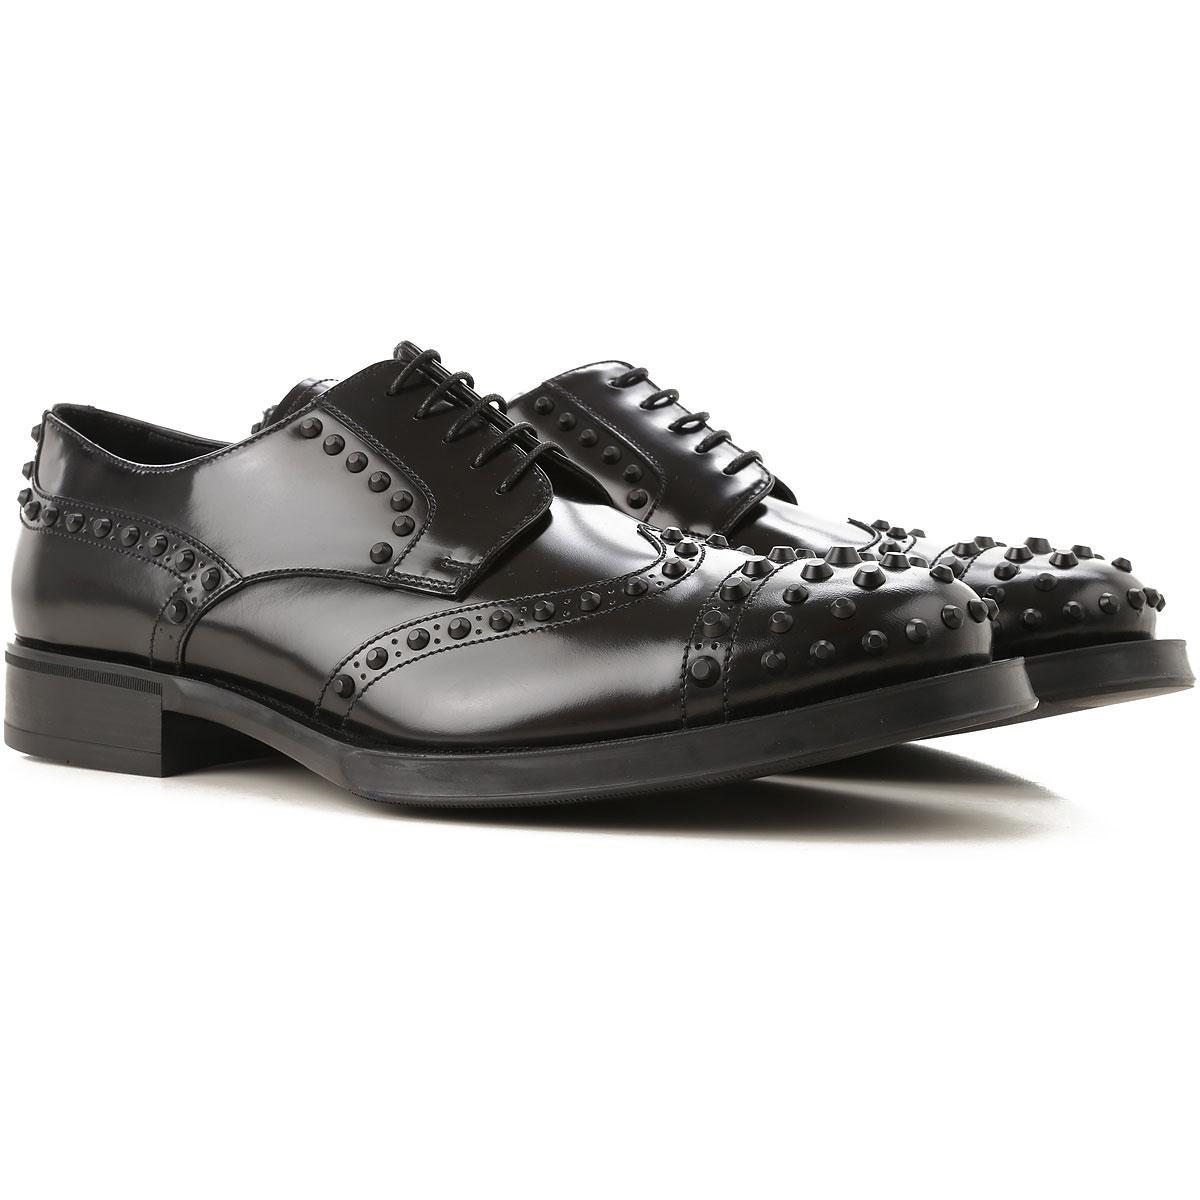 477e8d29d1 Lyst - Prada Lace Up Shoes For Men Oxfords in Black for Men